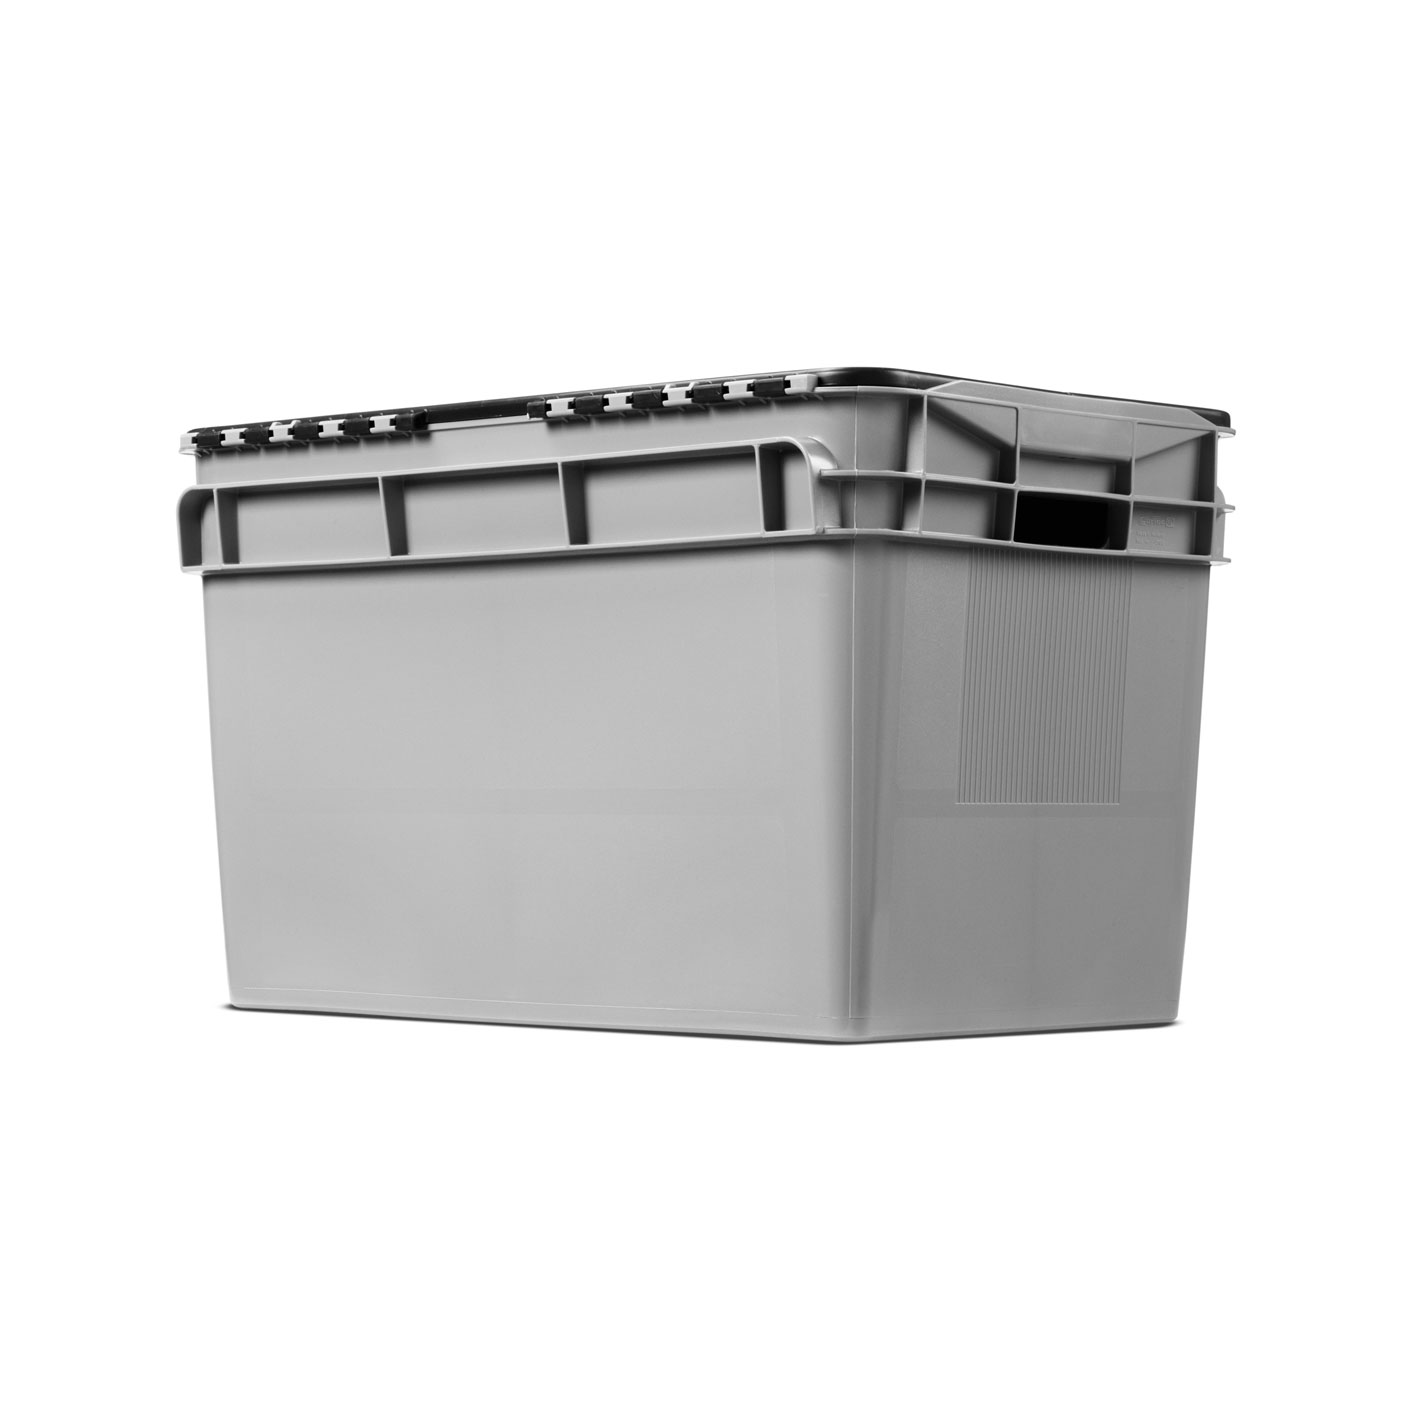 60 litre lidded crate